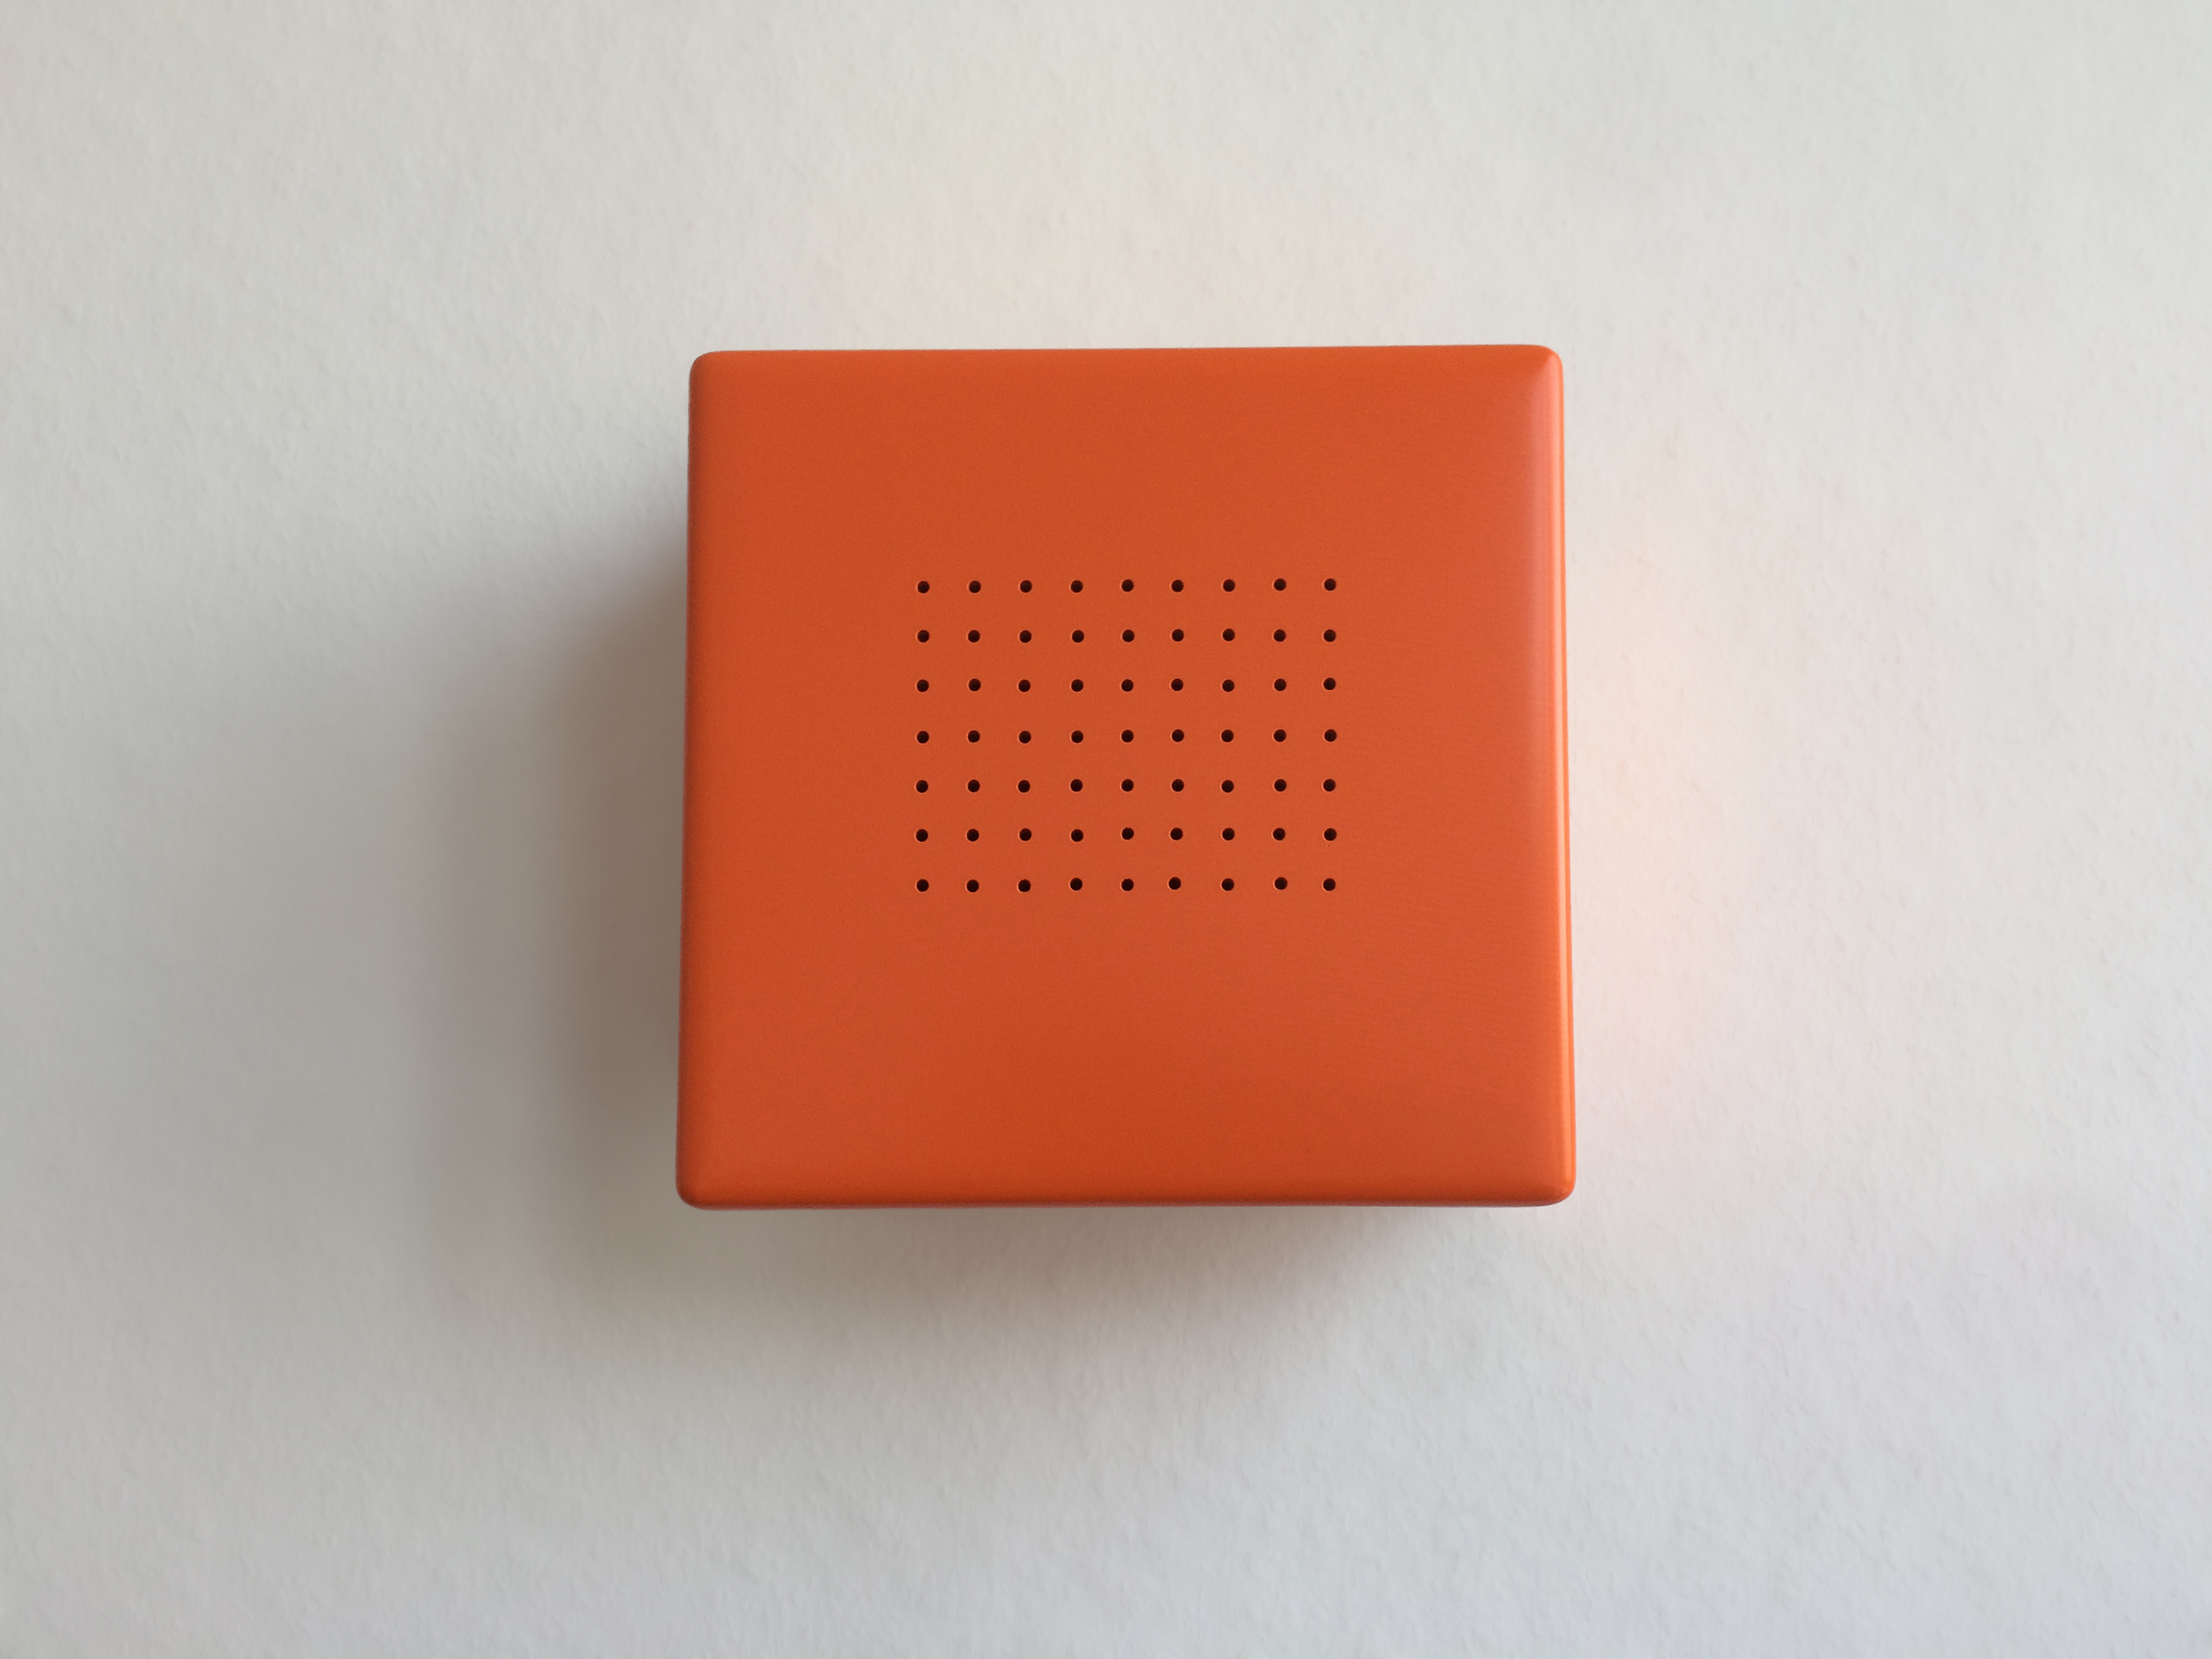 Lautsprecher02